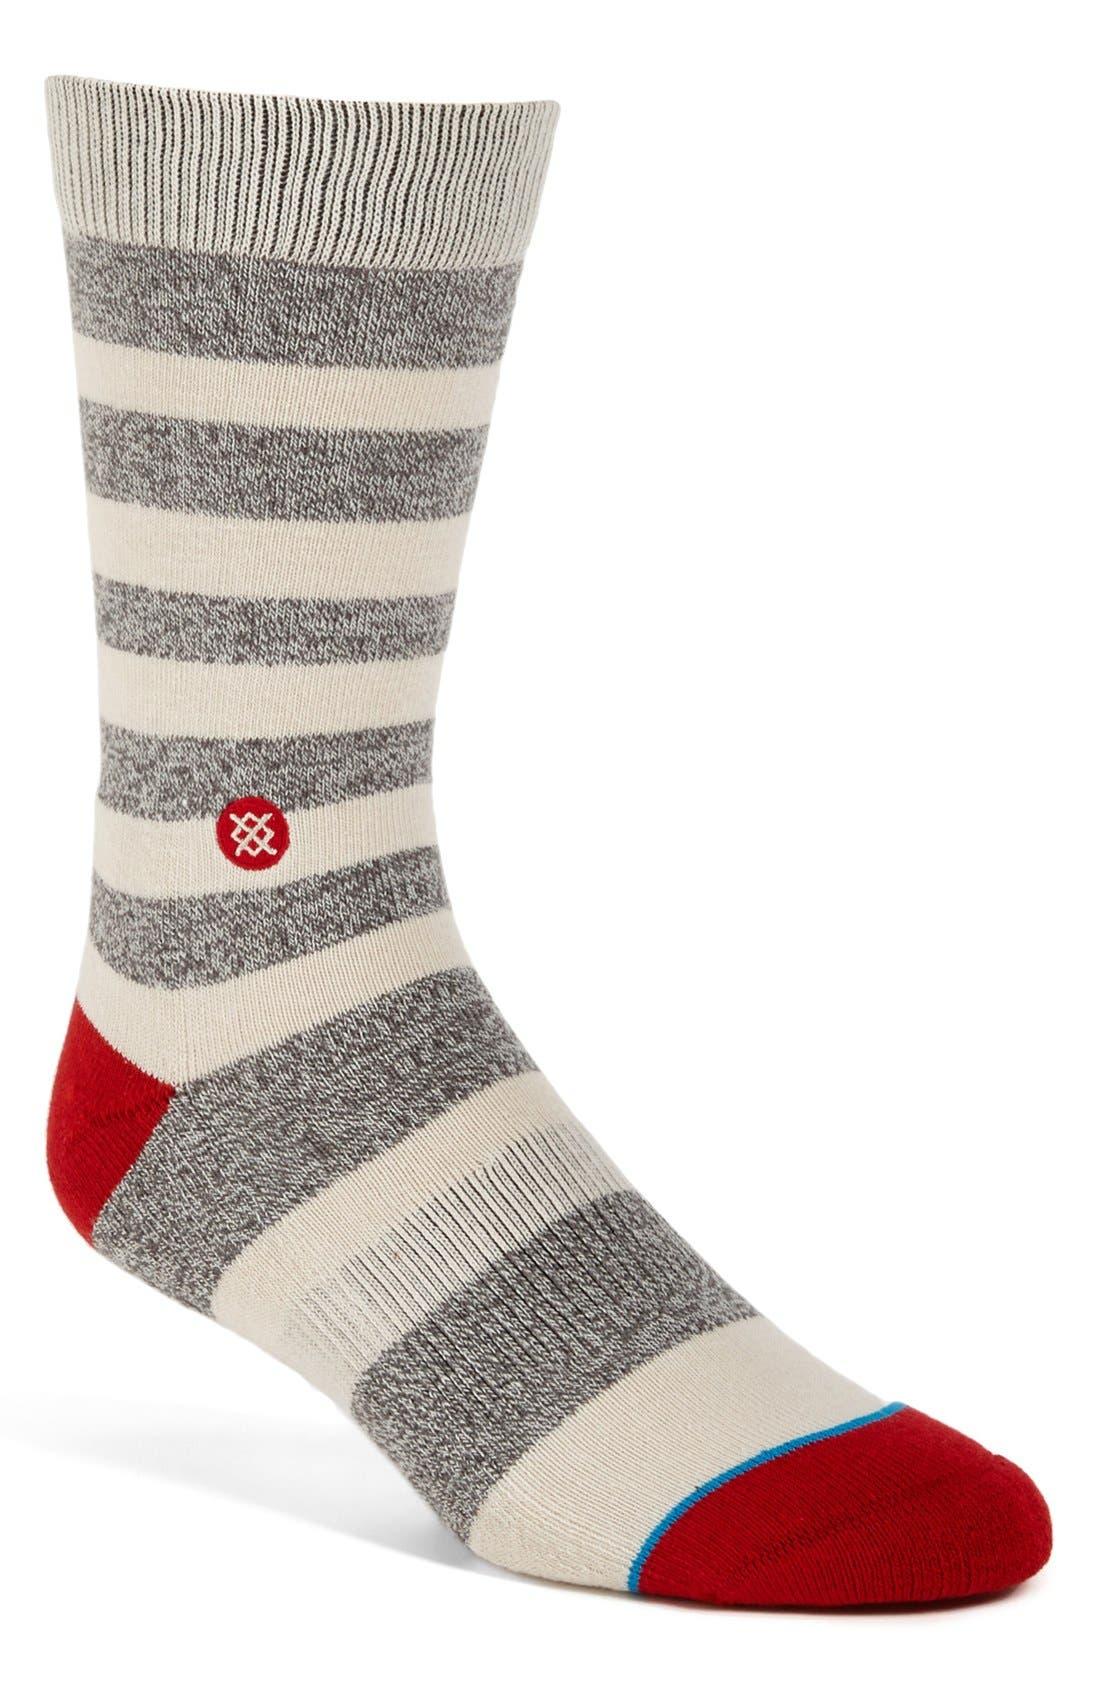 Alternate Image 1 Selected - Stance 'Striation' Socks